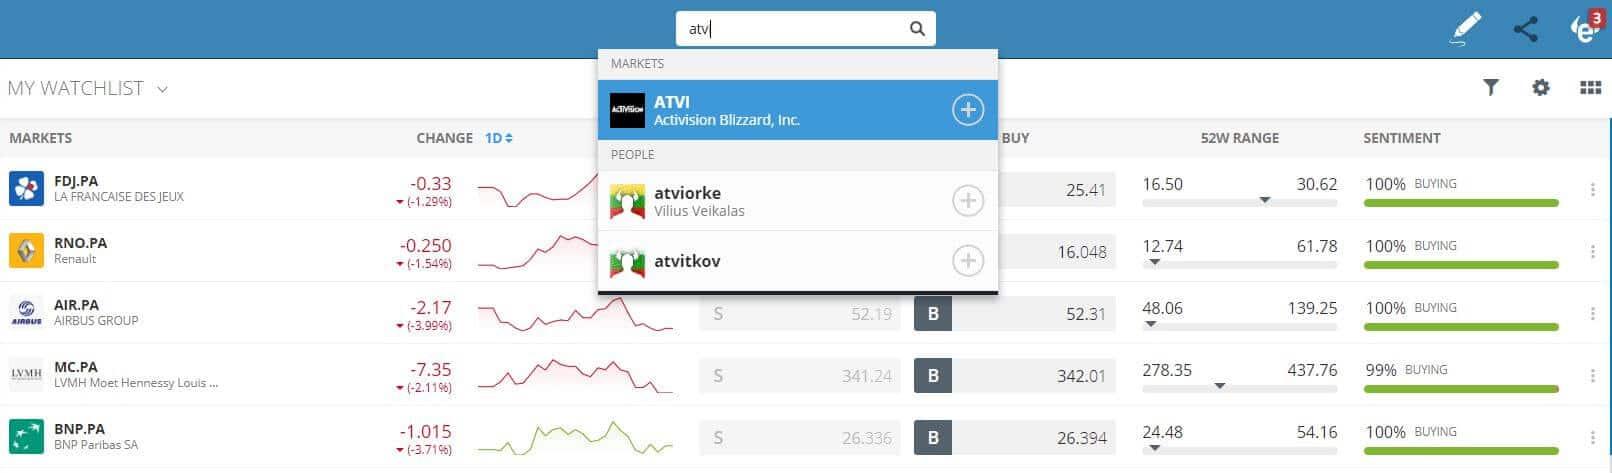 Browse Activision Stock on eToro